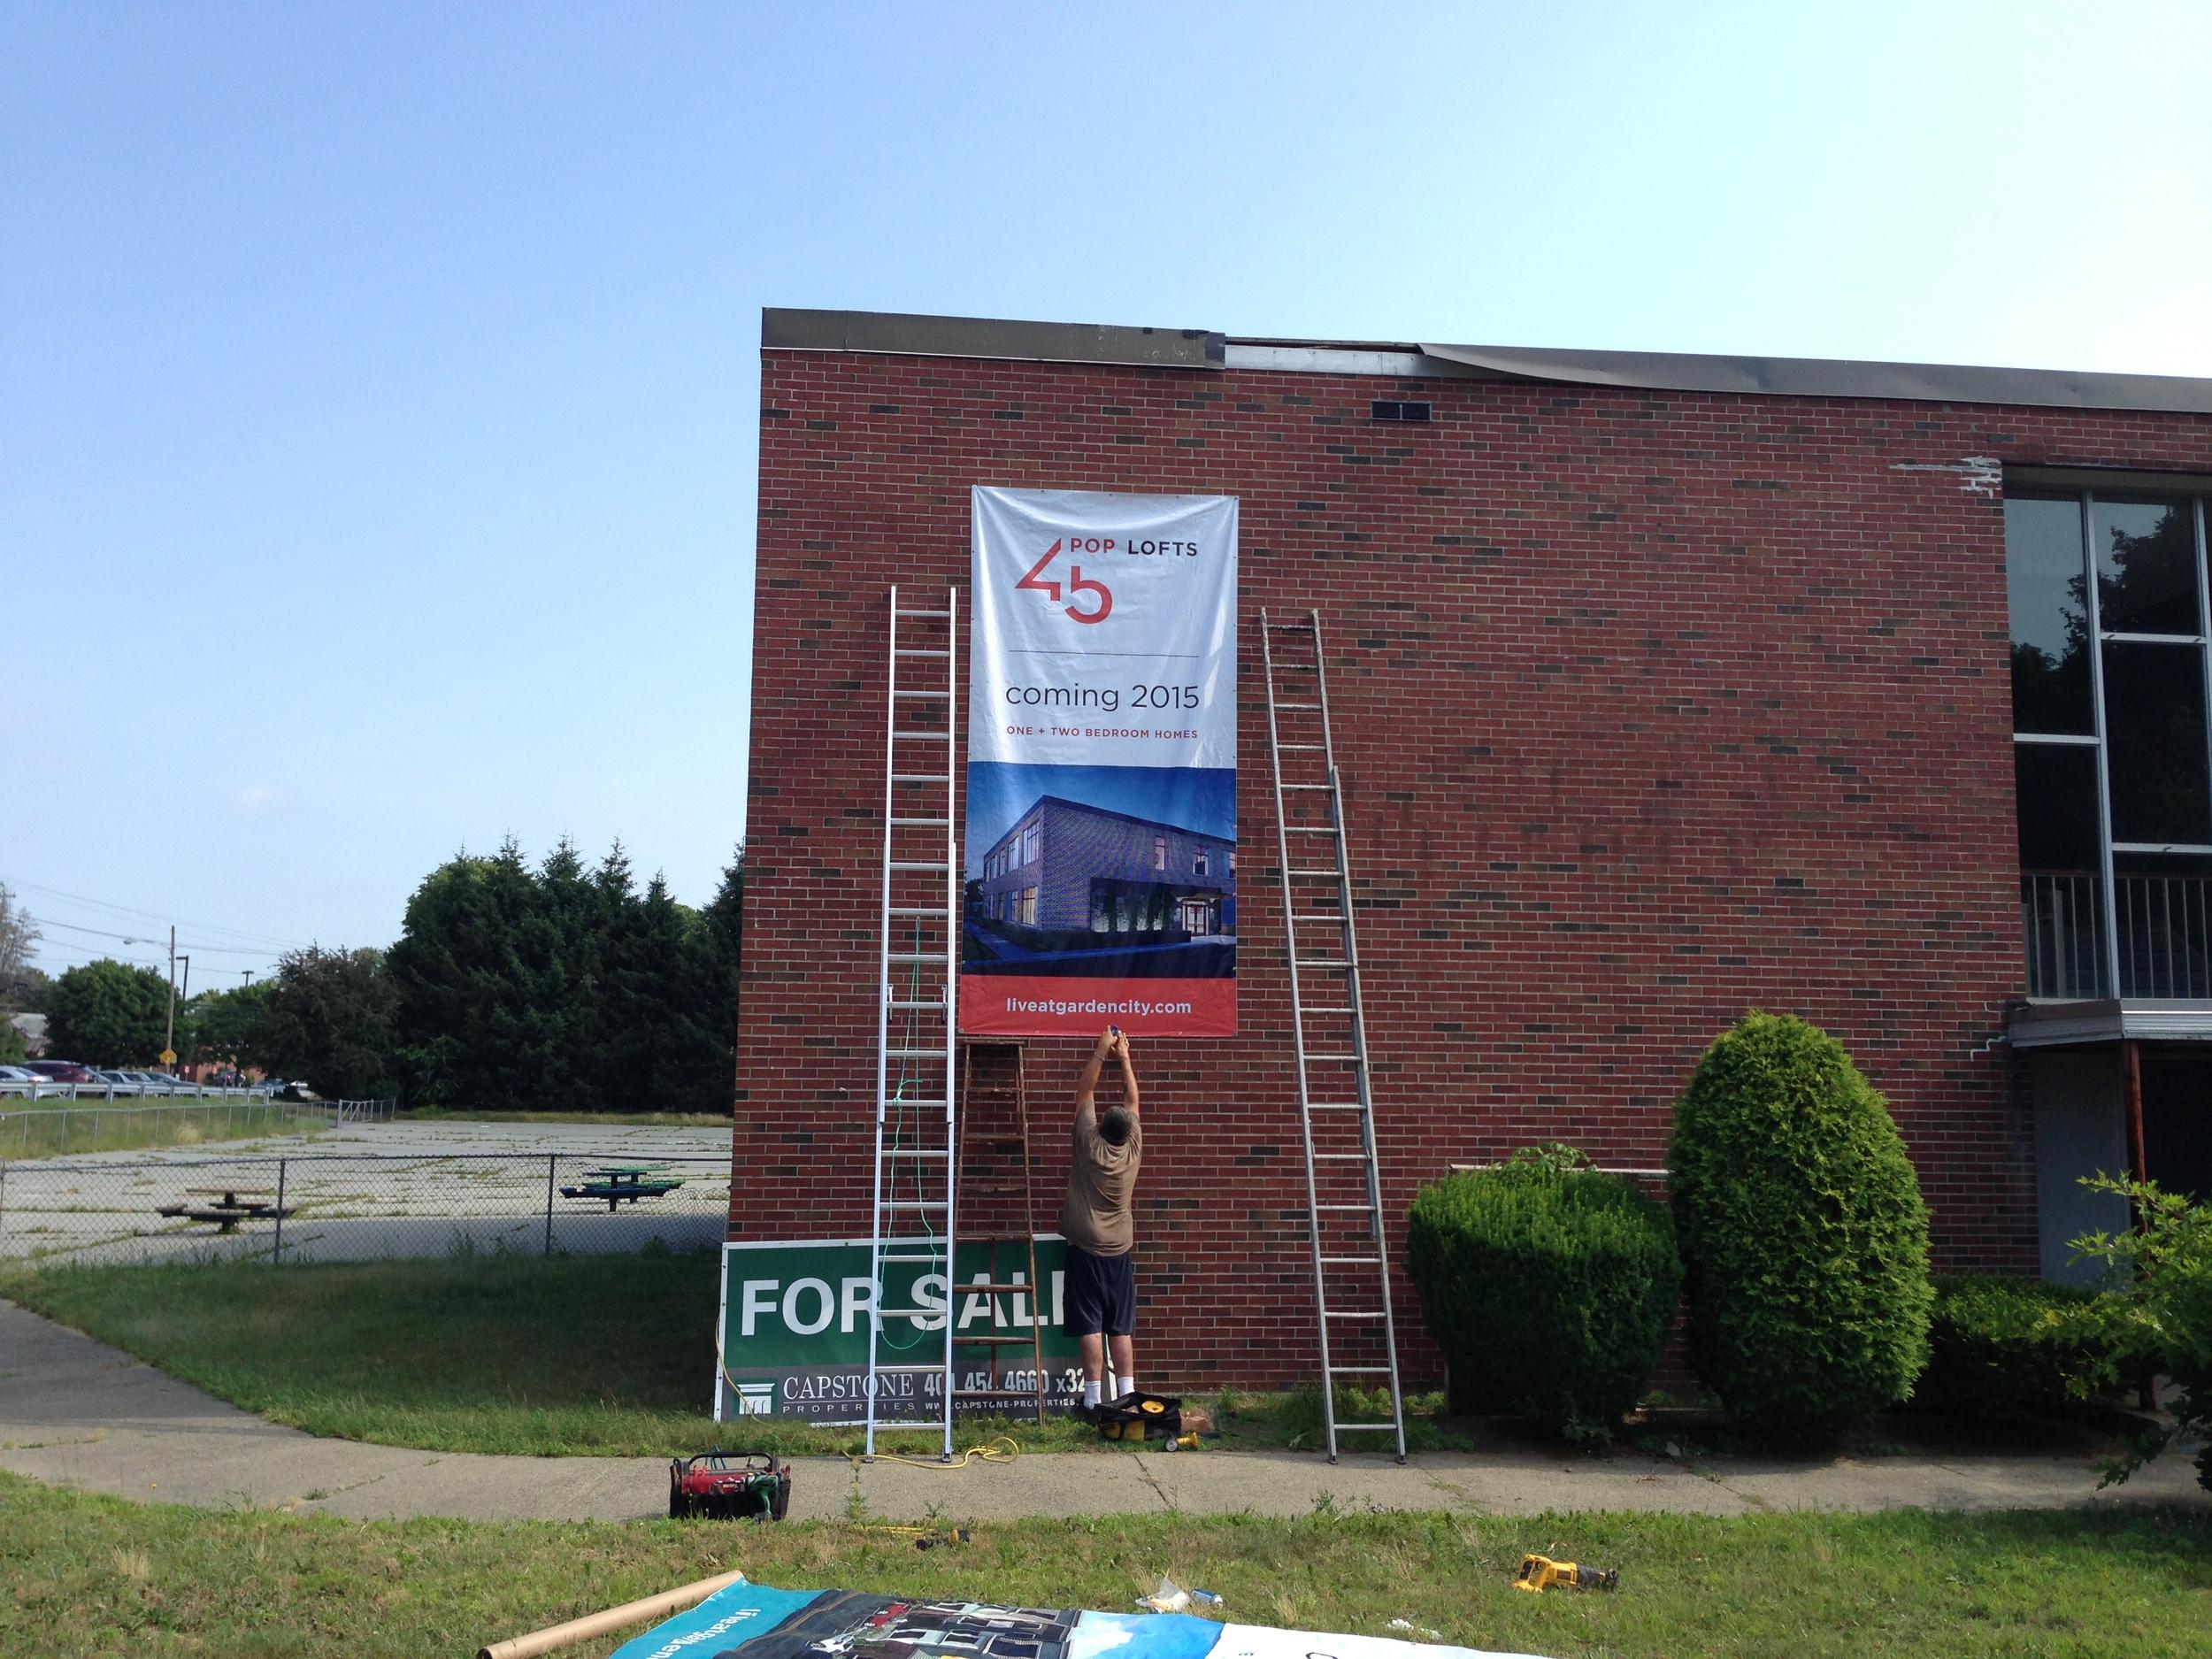 New banner - construction begins